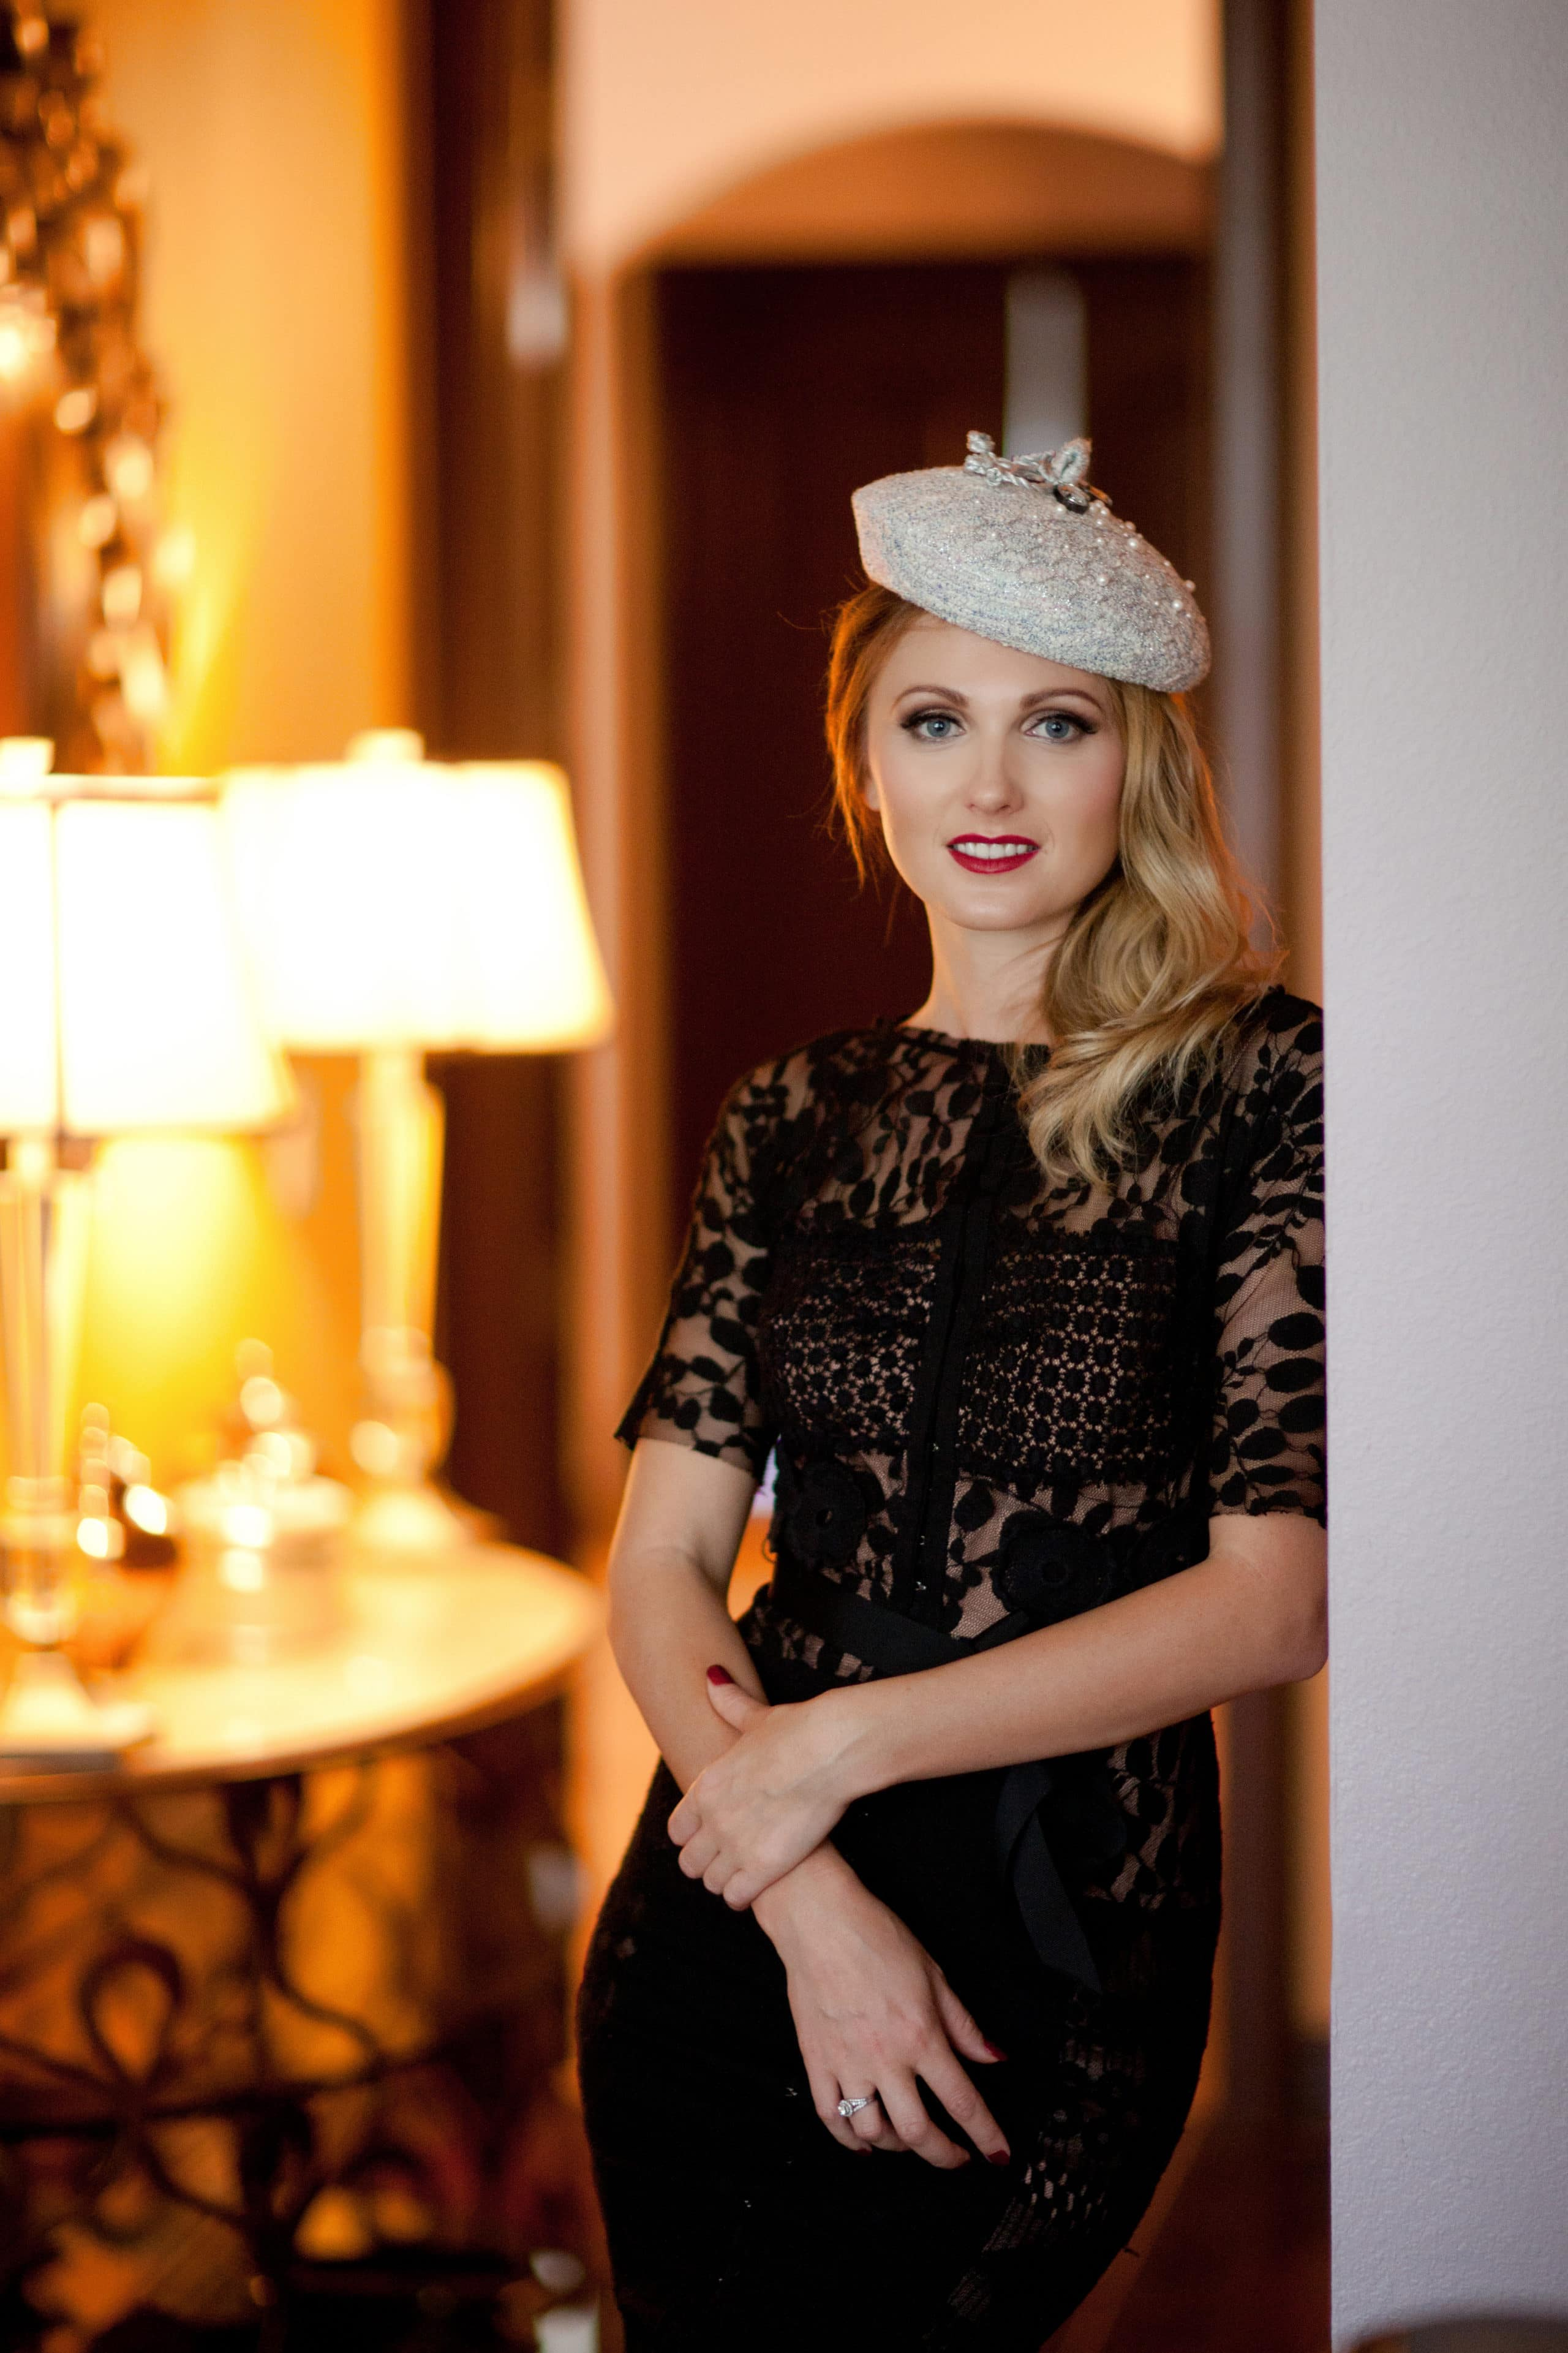 Beautiful model in a black dress by Tamara Knight Photography